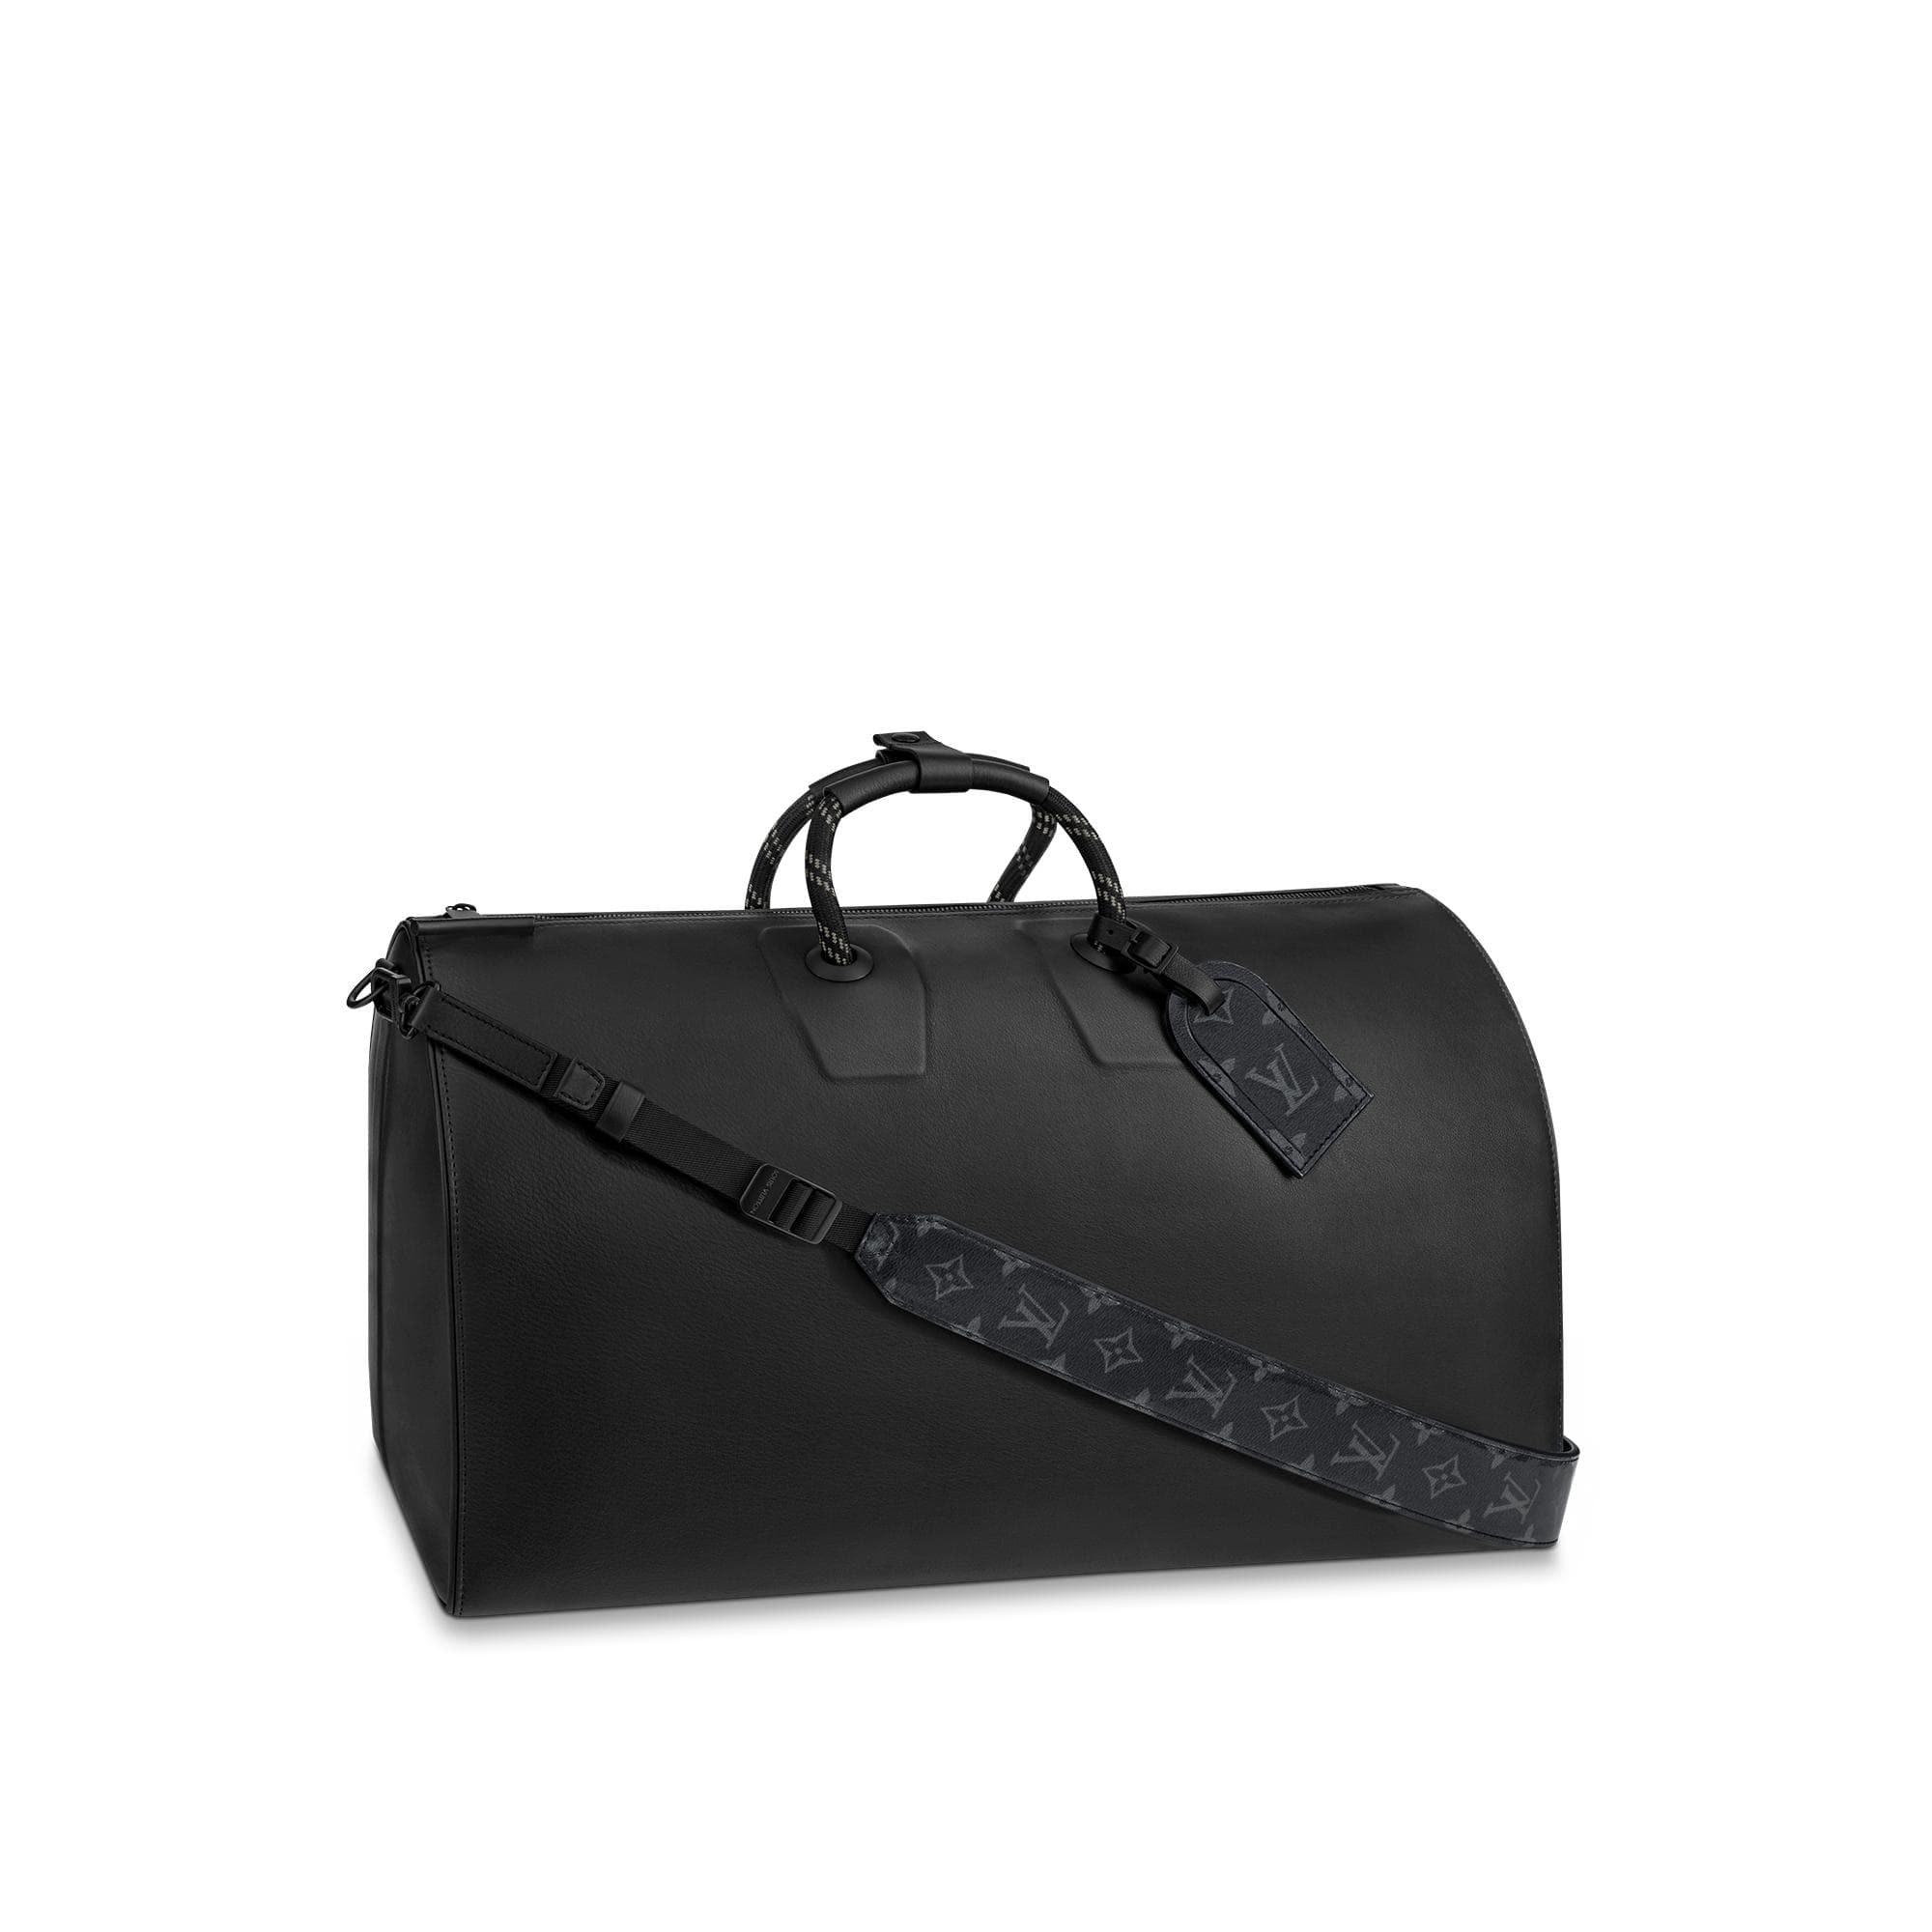 Louis Vuitton Keepall Bandouliere 50 Black Dark Infinity